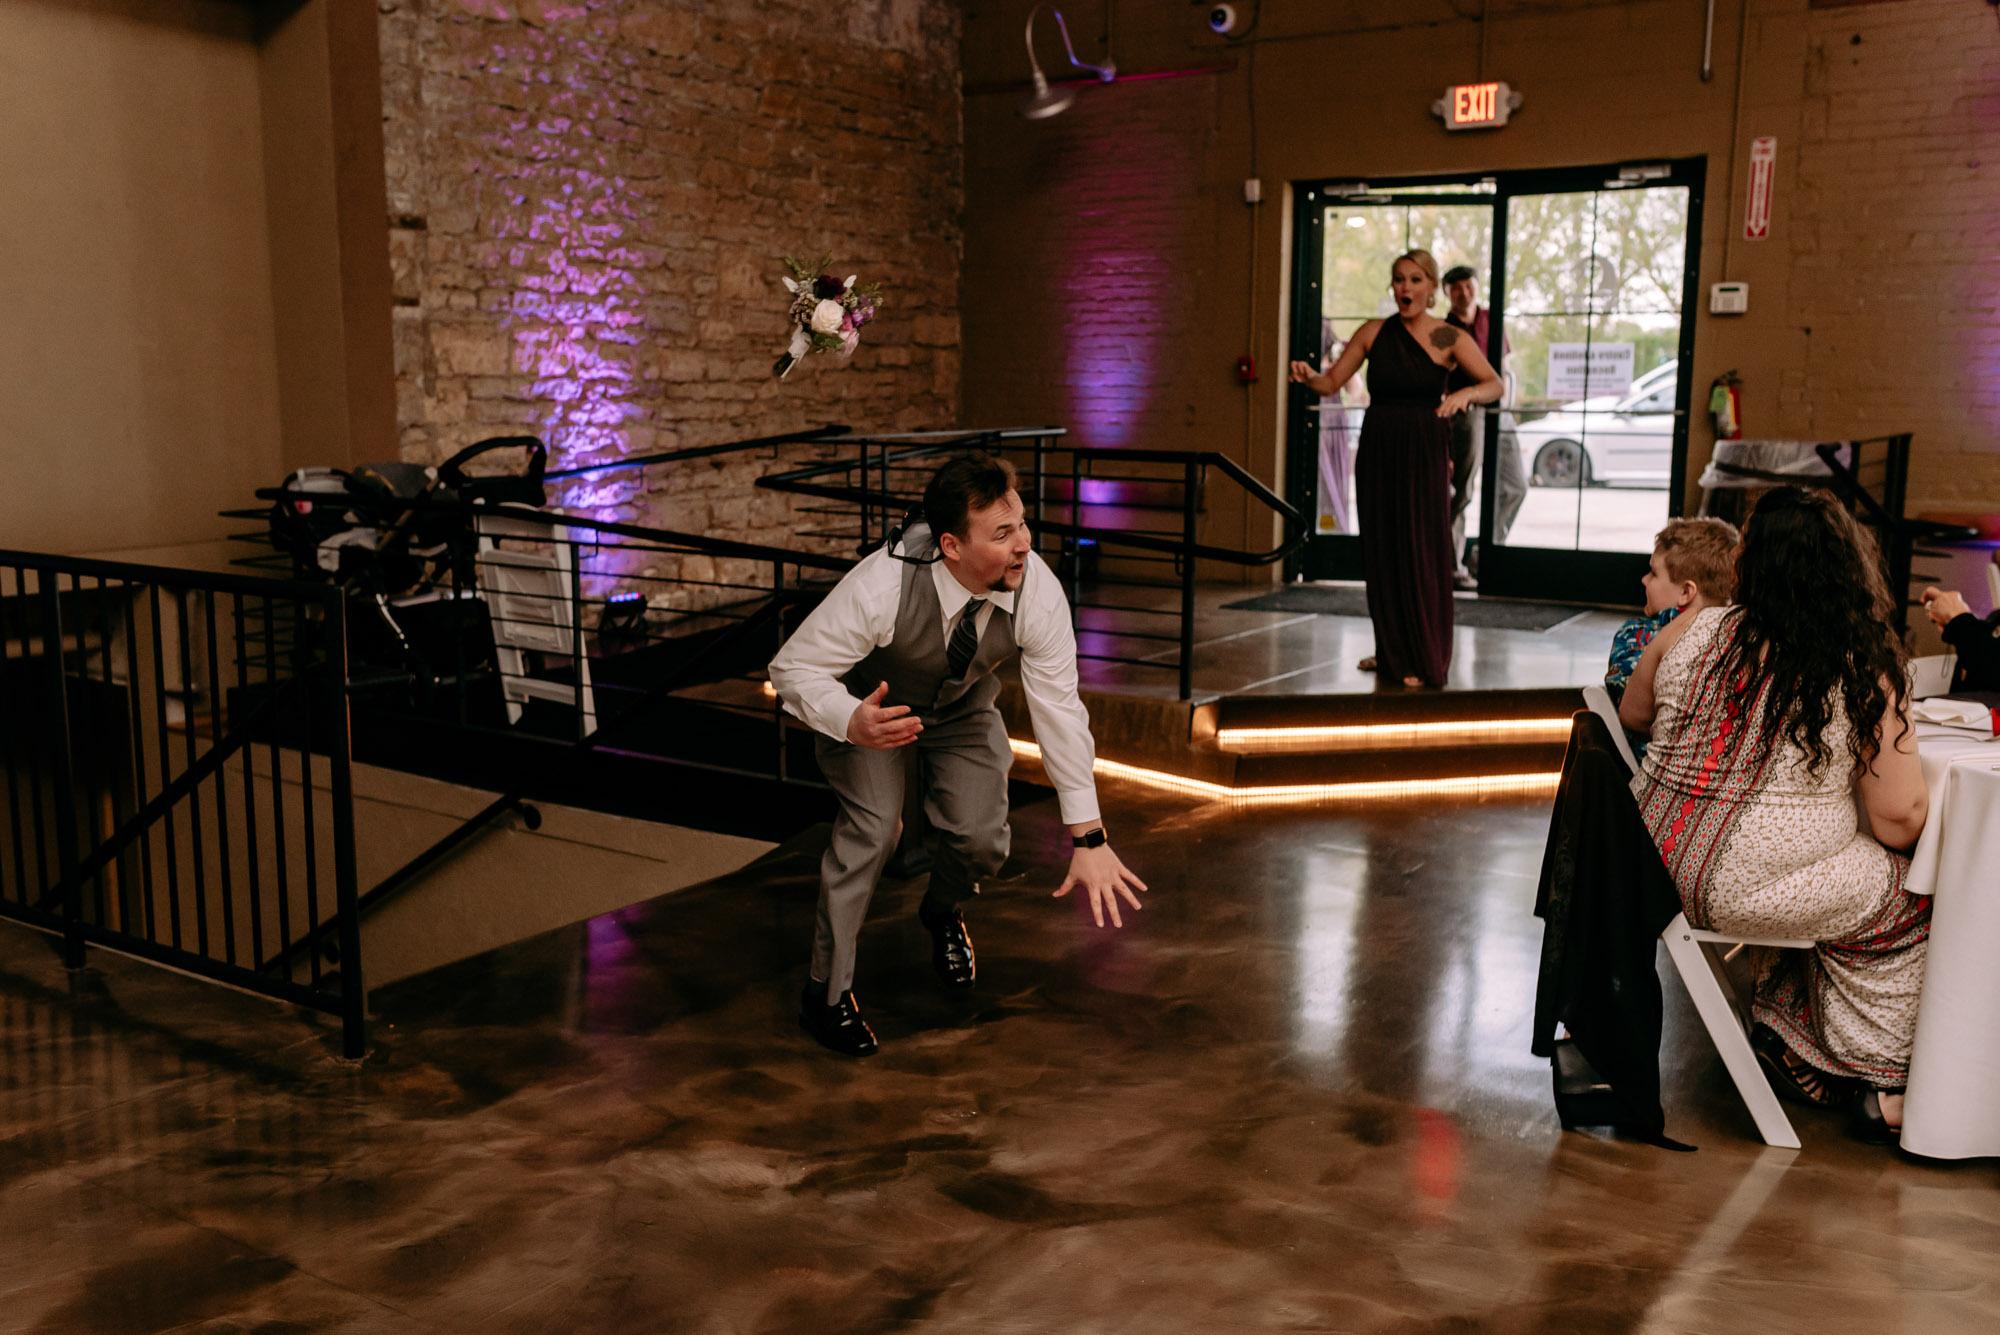 prairie-street-brewhouse-wedding-Rockford-IL-wedding-photographers-239.jpg